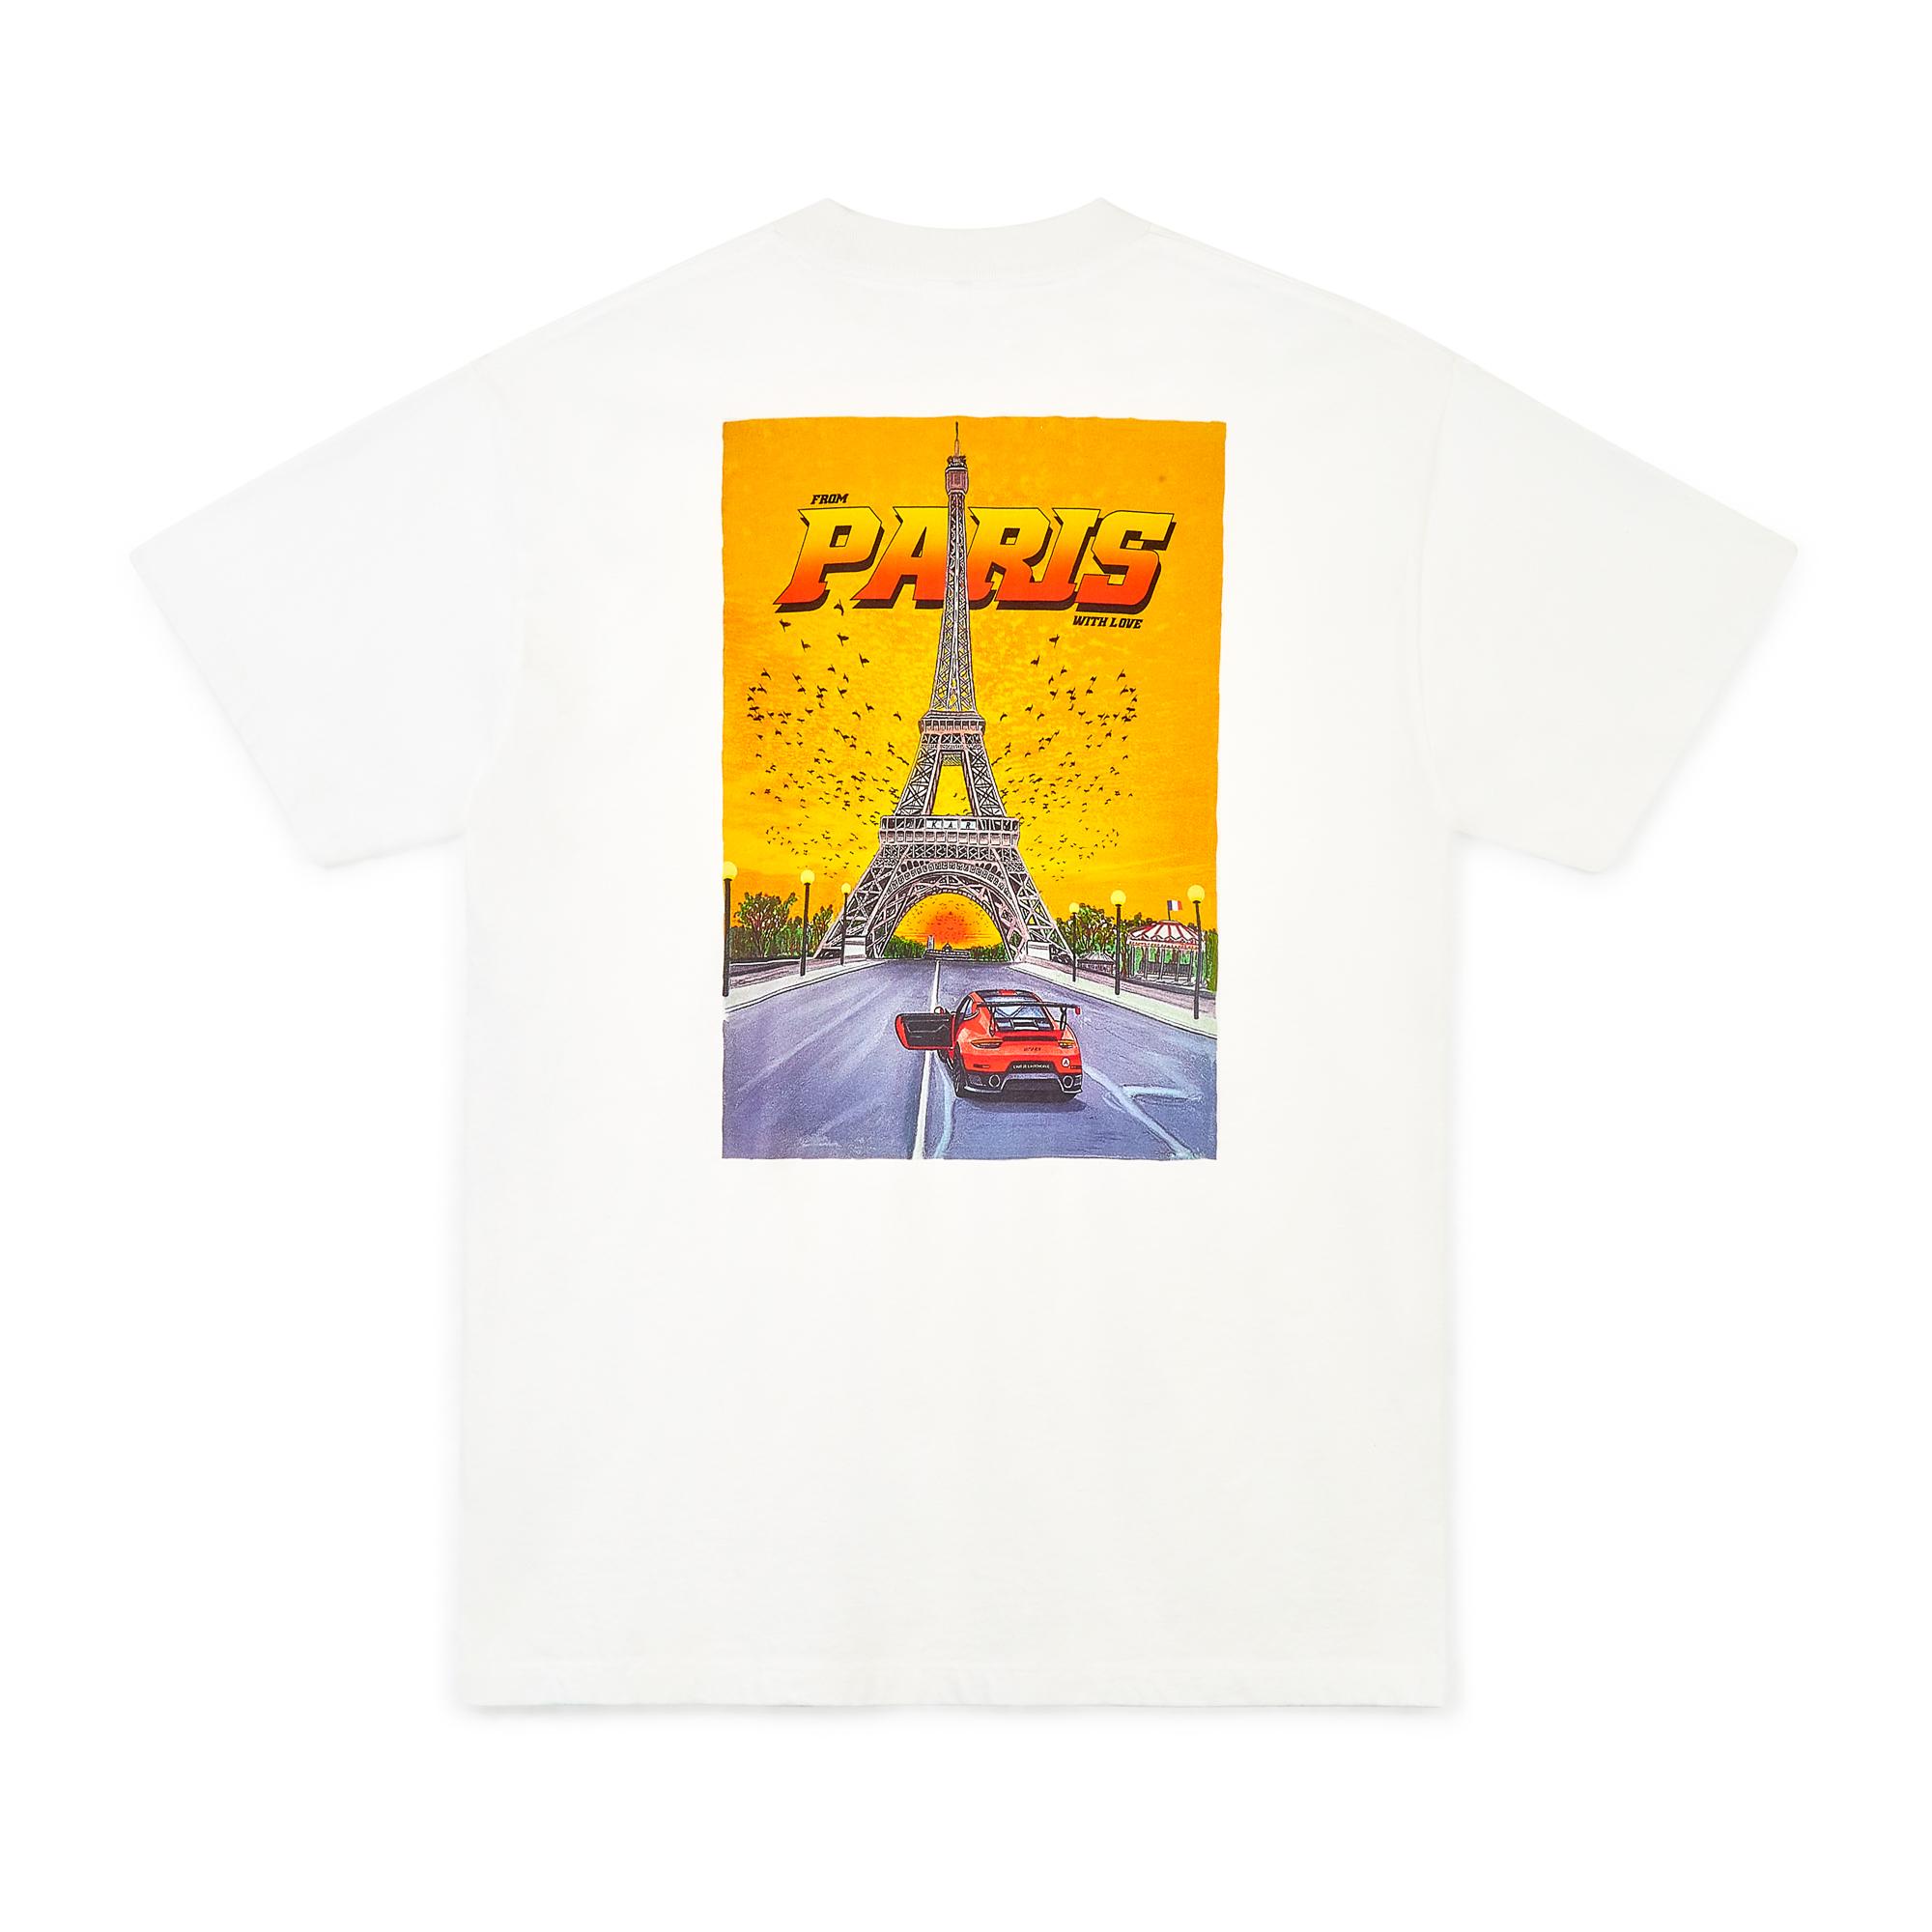 Kar / L'Art de L'Automobile - shot 12